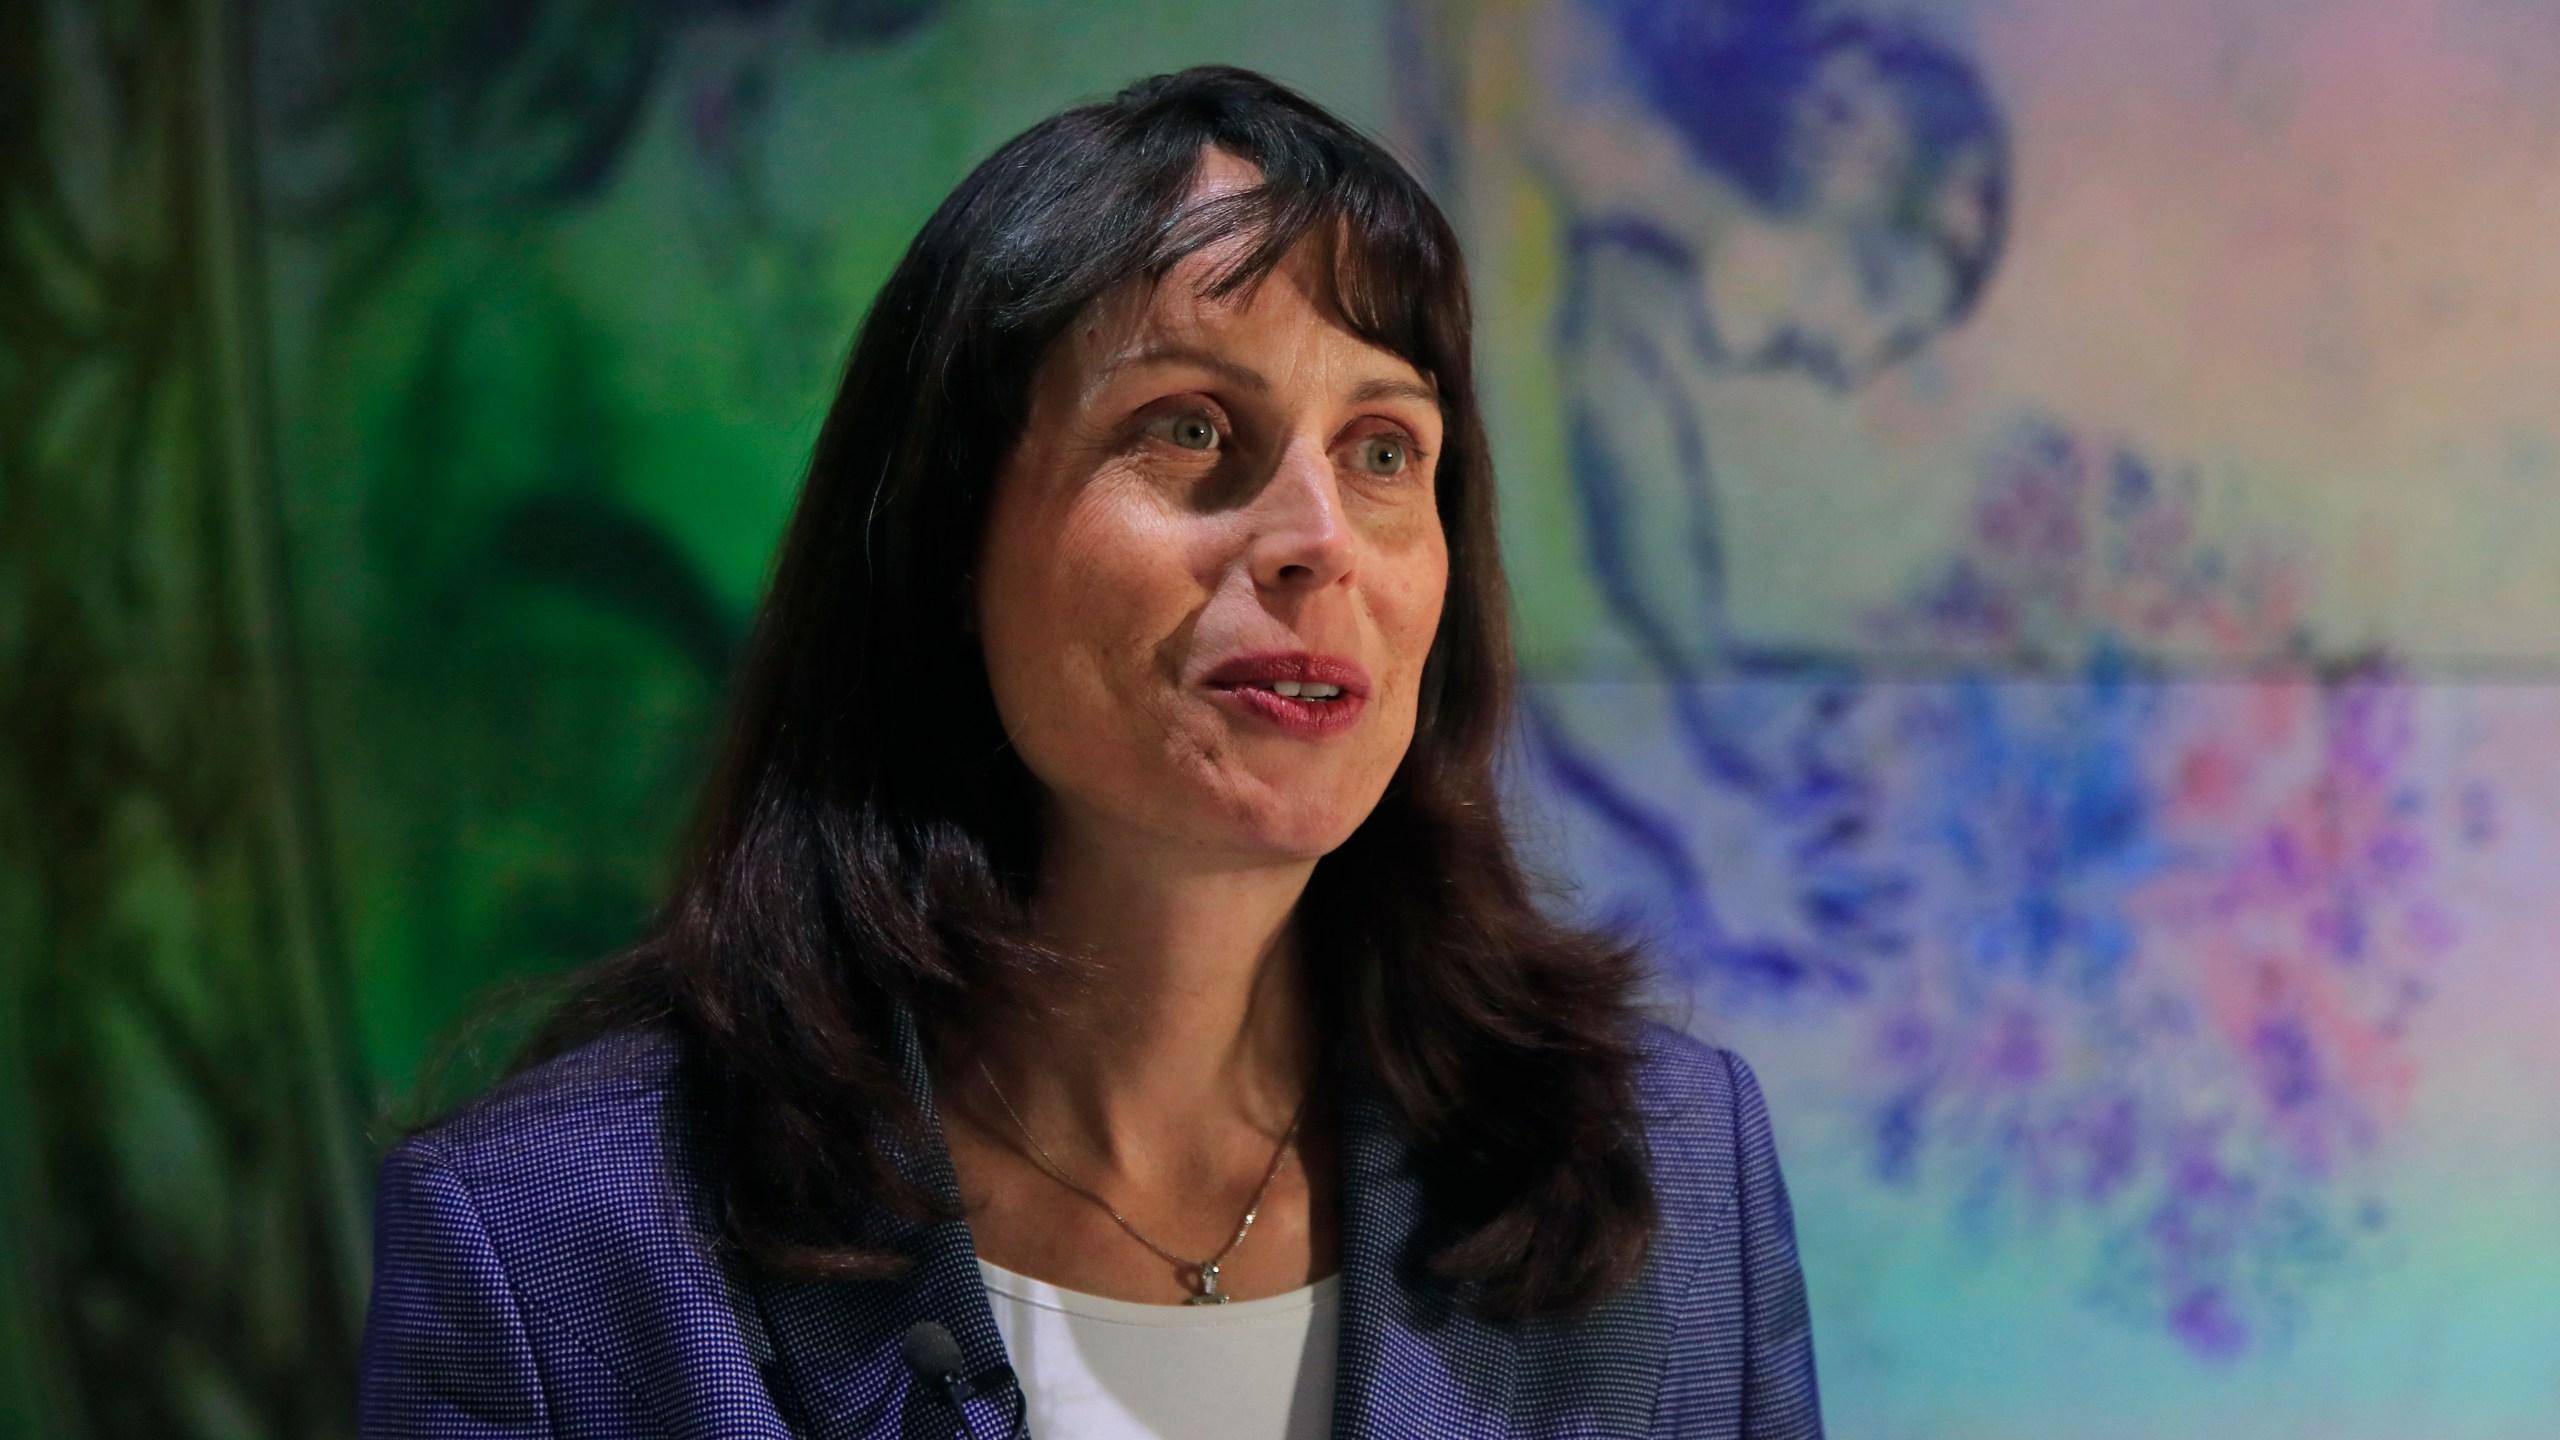 Jacqueline Fuller